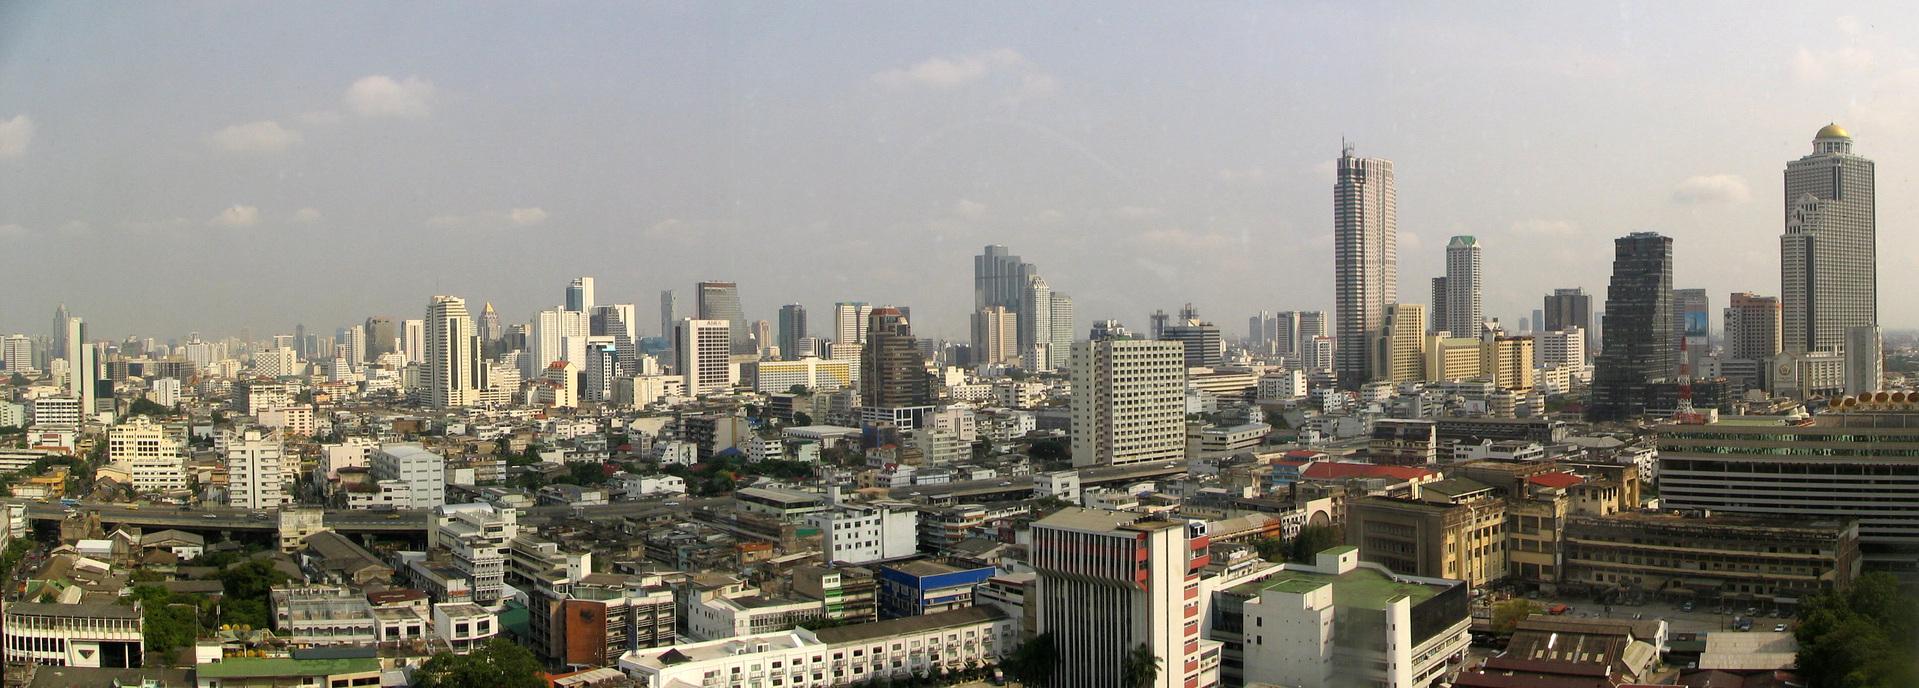 bangkok-view-1452617-1919x687